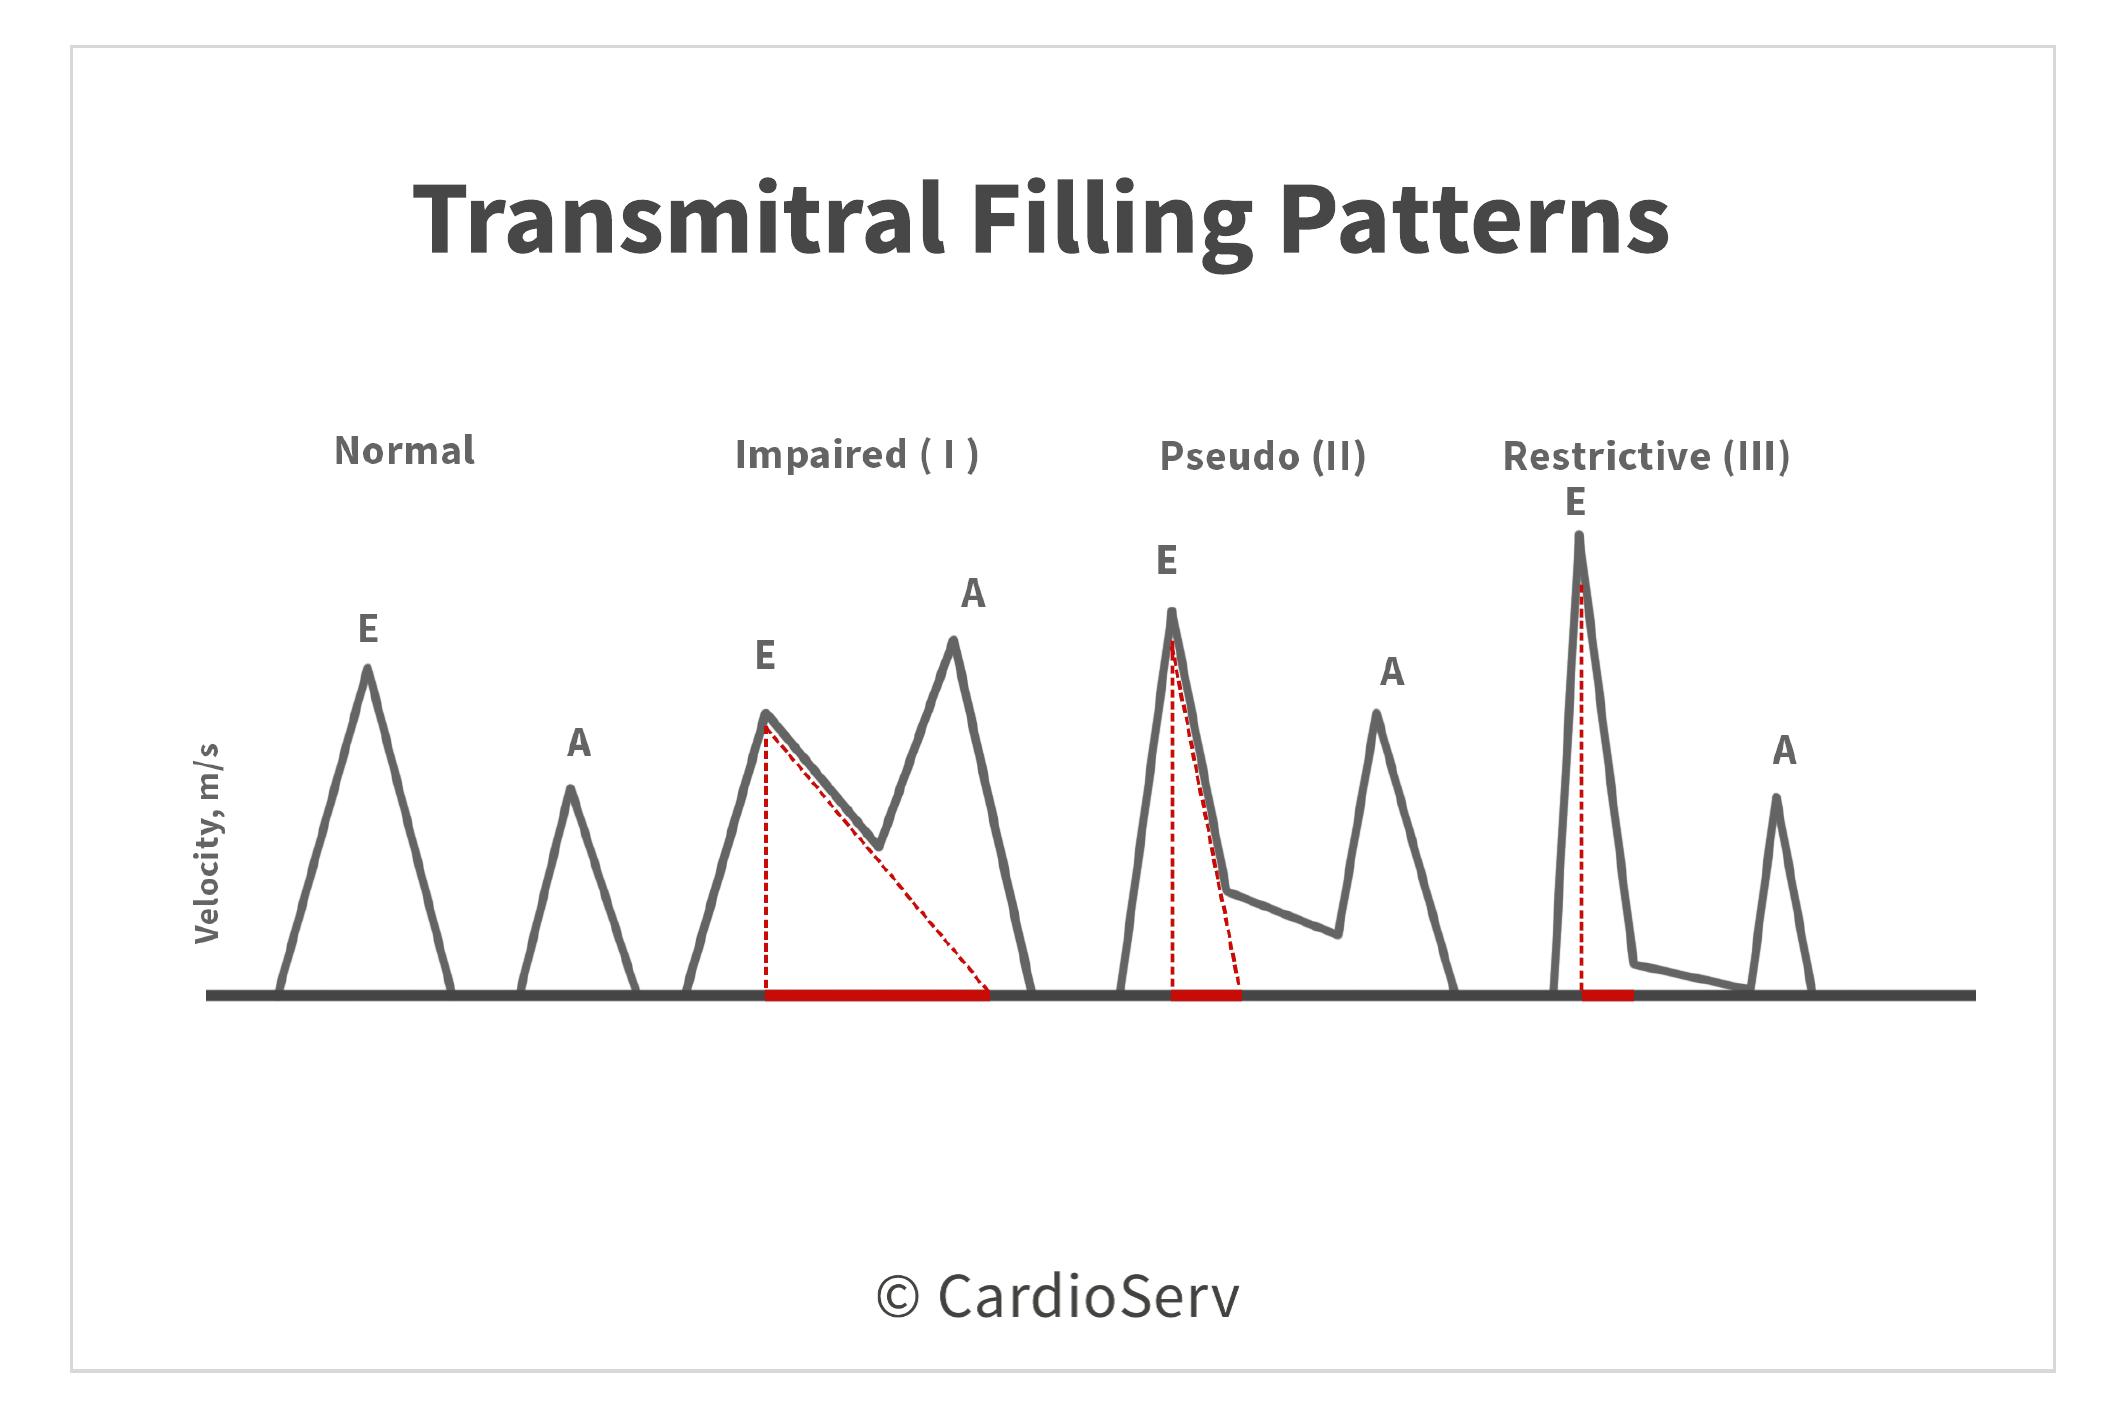 Transmitral Filling Patterns Diastolic Function